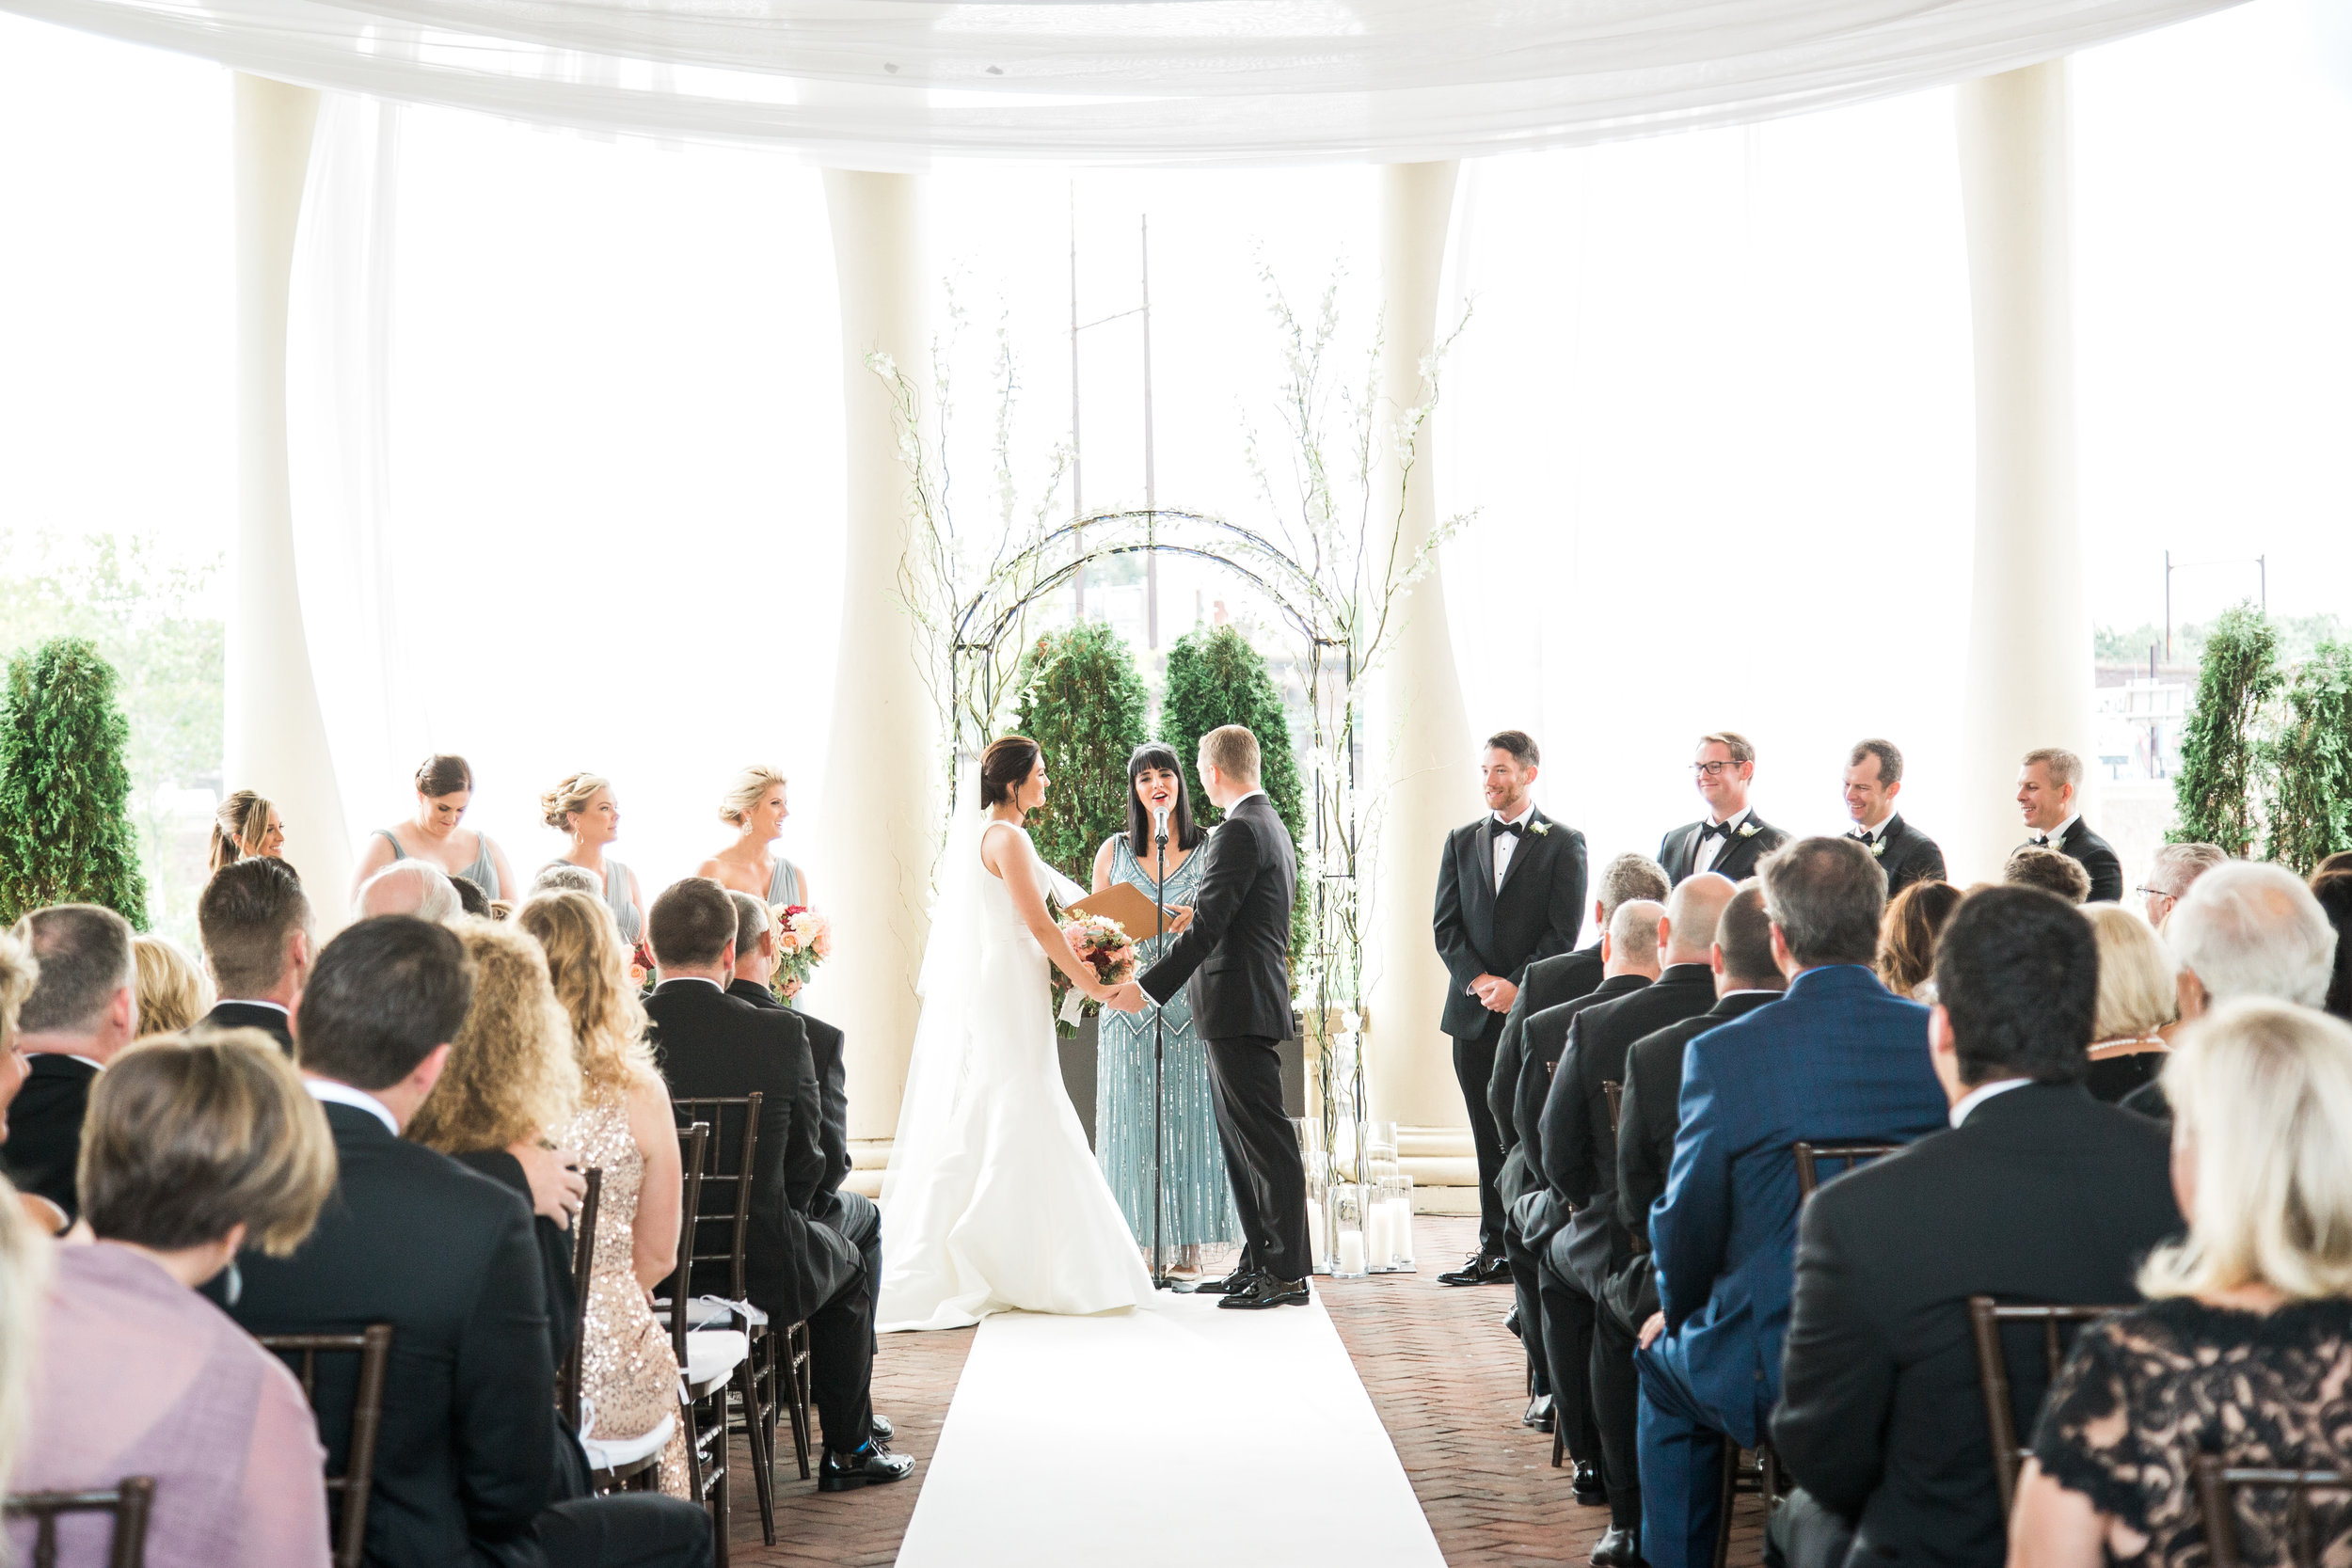 Hudson-Nichols-Black-Tie-Bride-Philadelphia-Waterworks-Wedding-Cescaphe-Ceremony22.jpg